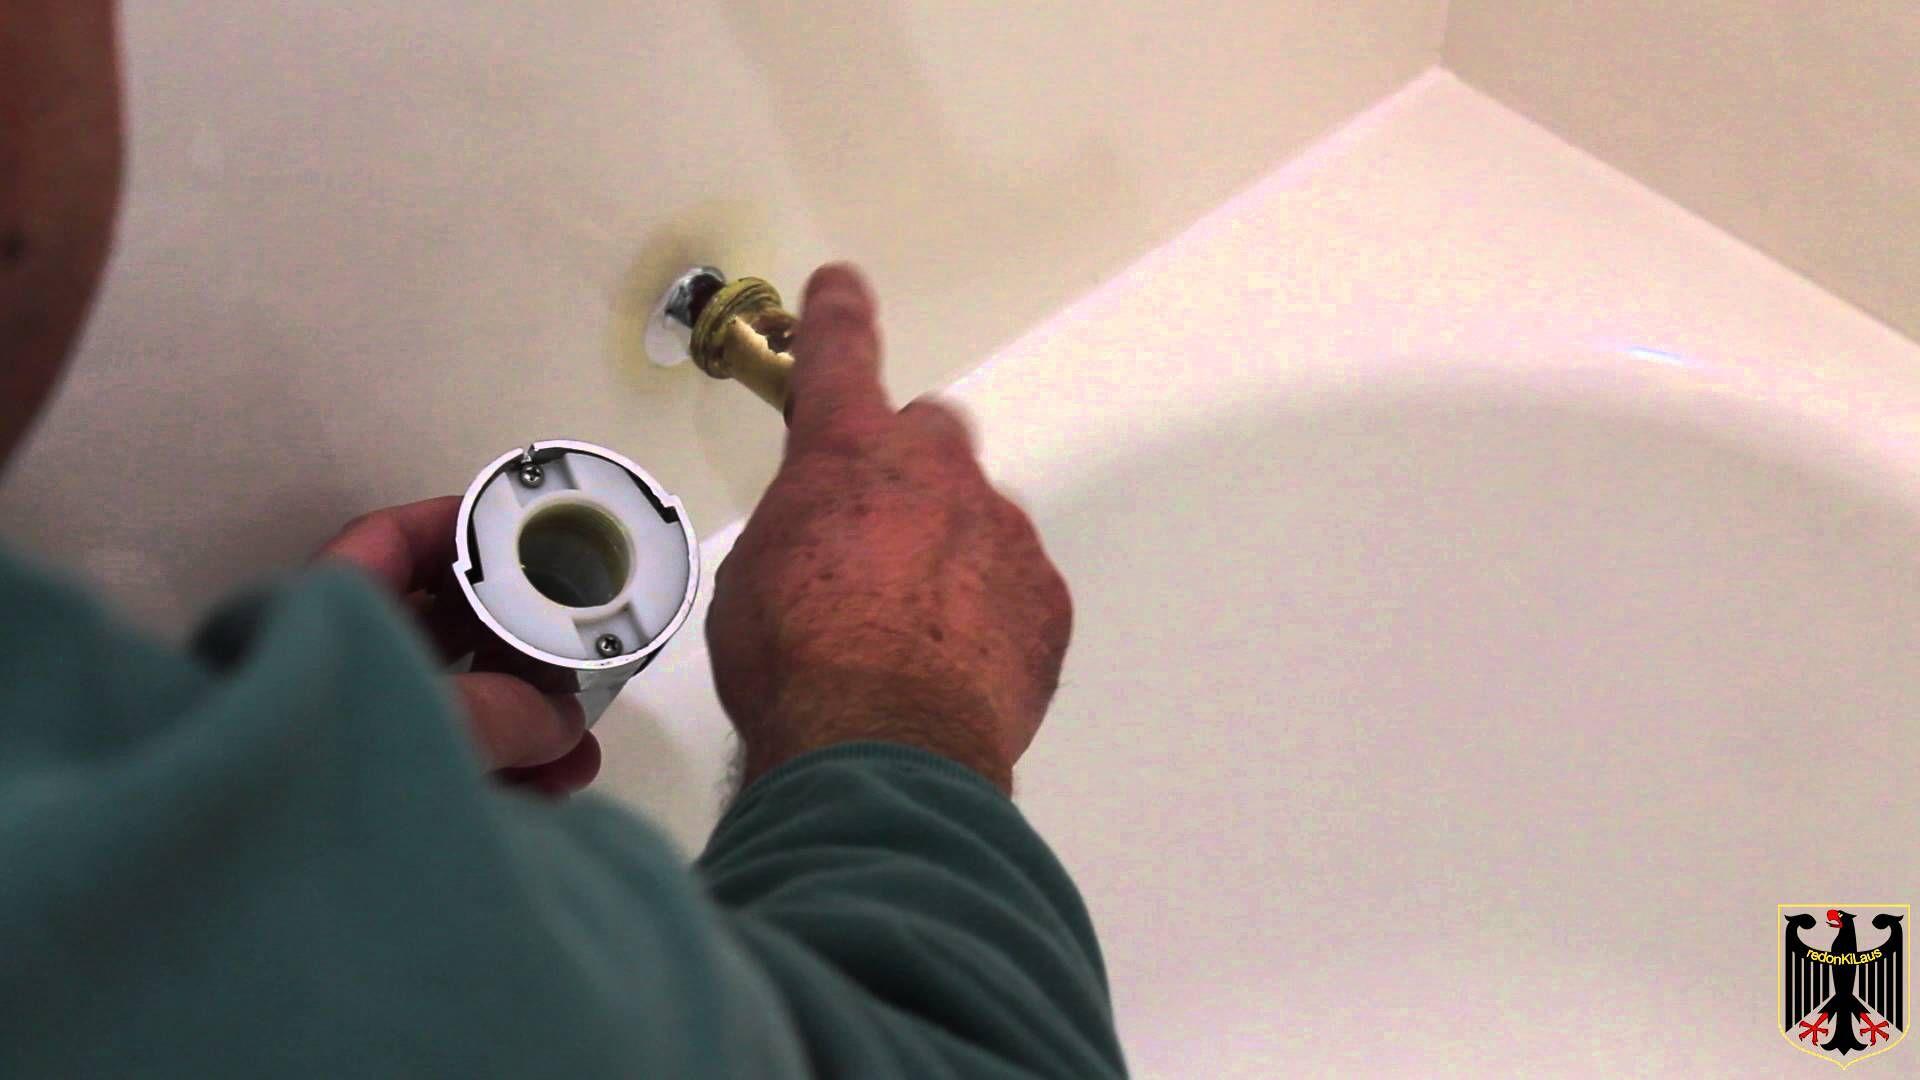 How To Fix A Leaking Delta Bathtub Faucet Faucet Faucet Repair